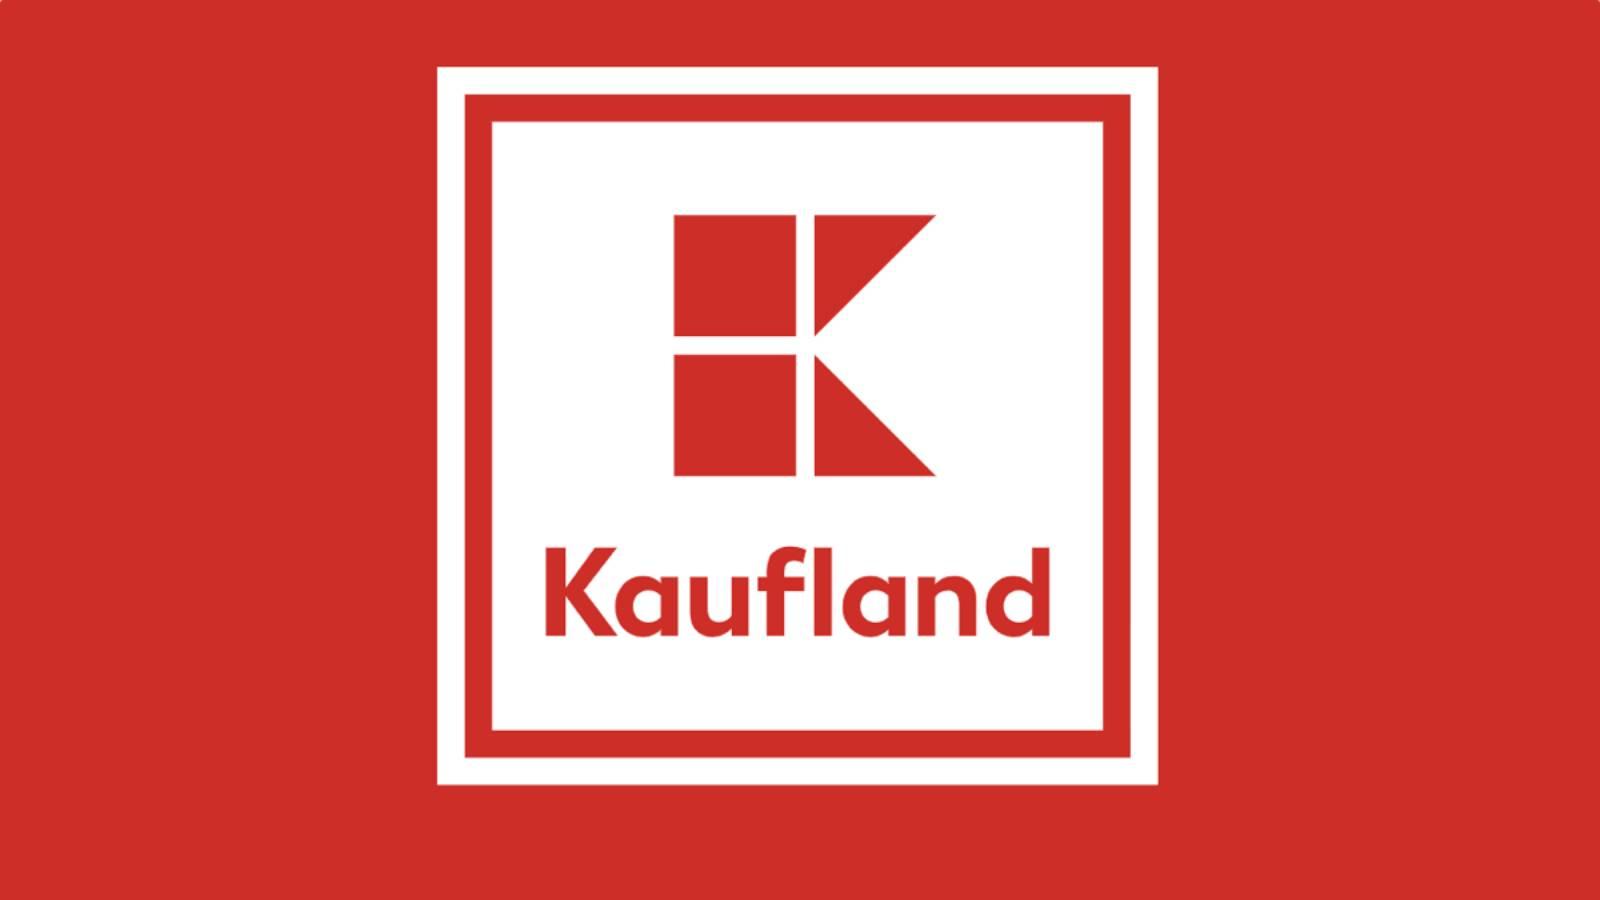 Kaufland unire